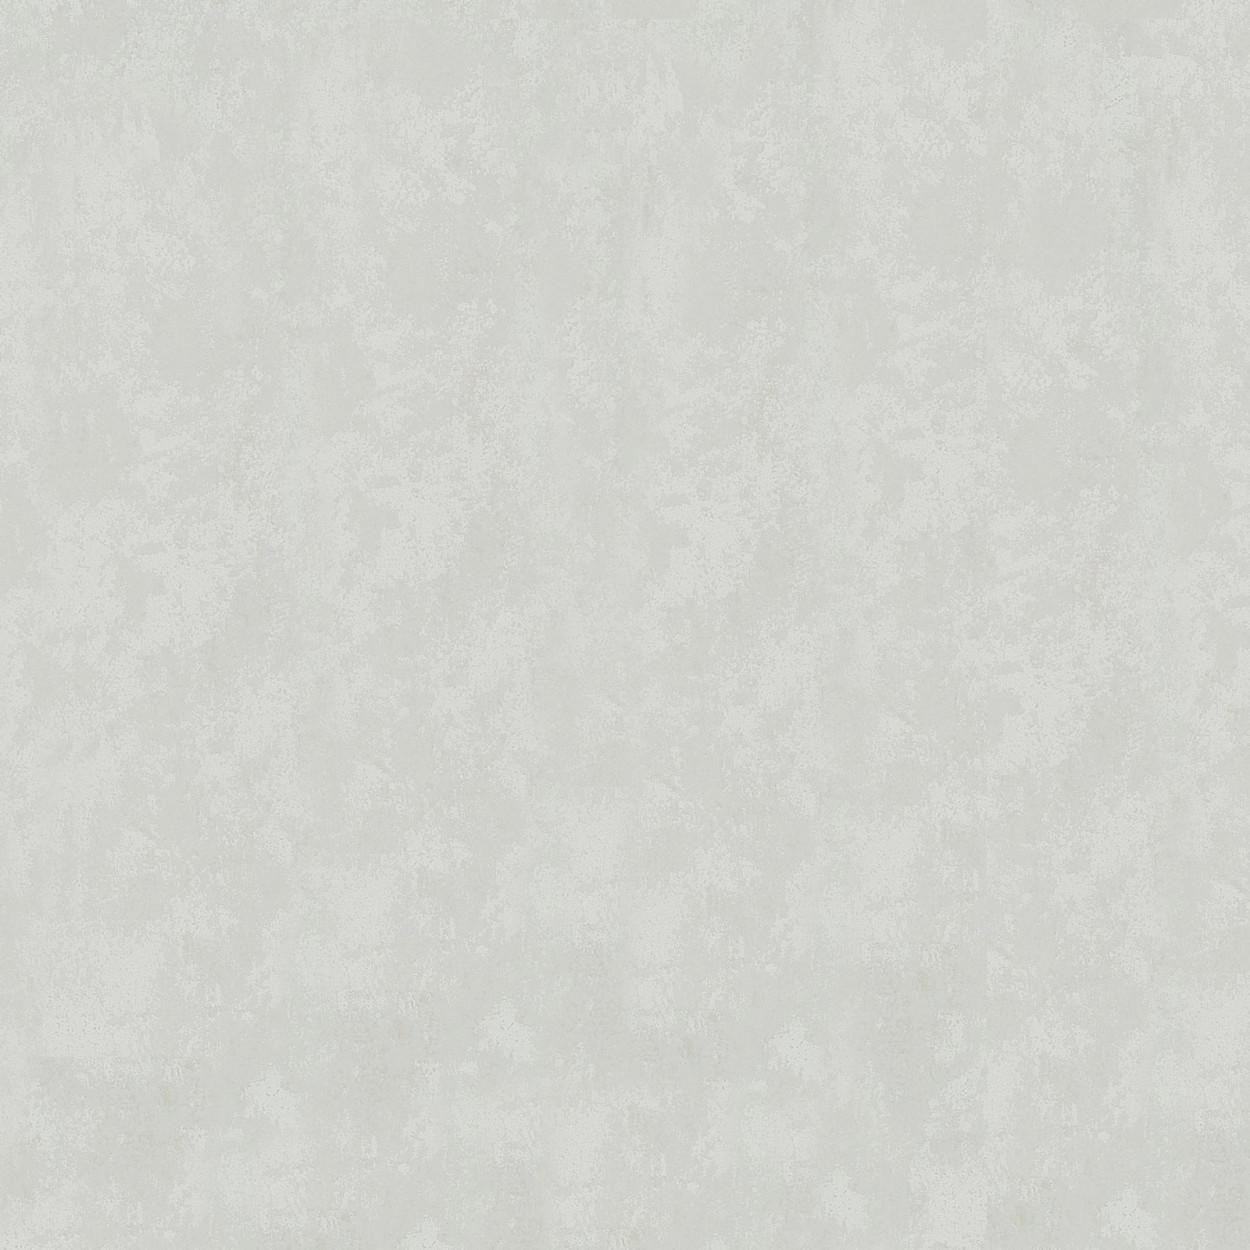 Full Size of Tapete Betonoptik Industrial Rasch Grau Hammer Obi Bauhaus Tedox Silber Tapeten Gold Dunkelgrau Braun Hornbach 150097 Livingwalls Styleguide Jung Fototapete Wohnzimmer Tapete Betonoptik